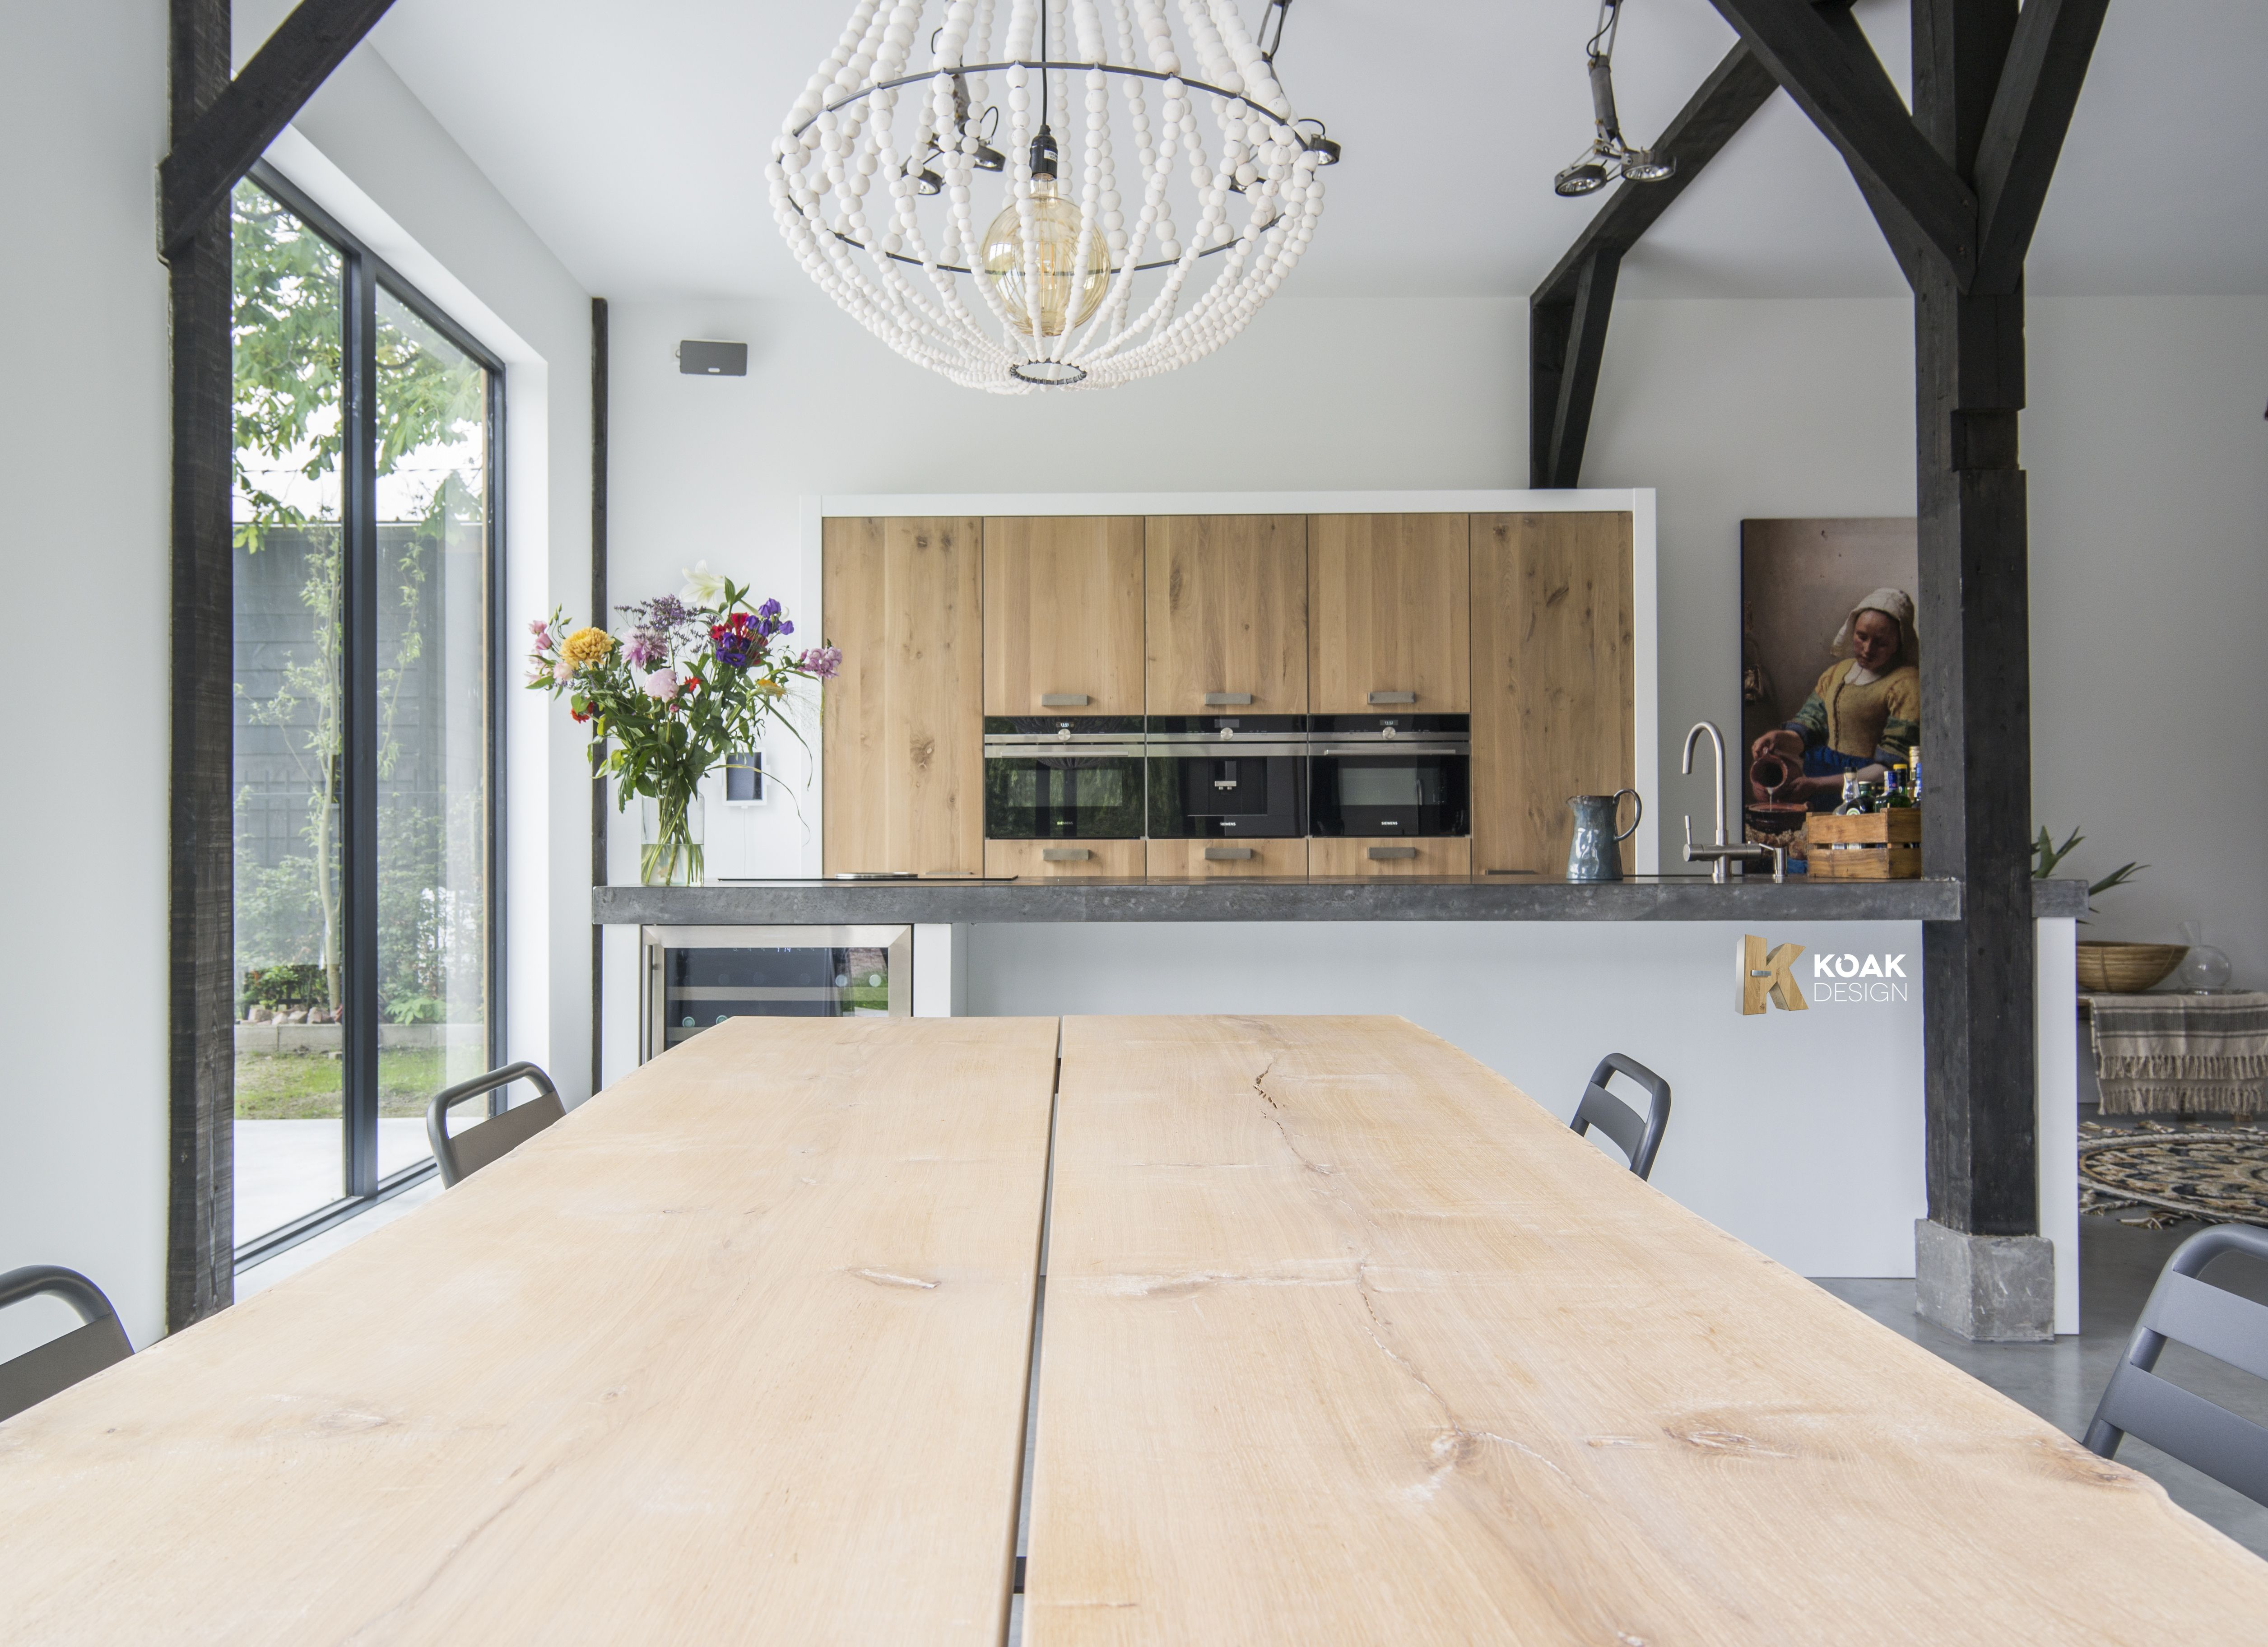 Tree Trunk Table In A Koak Design Kitchen With Koak Design You Can